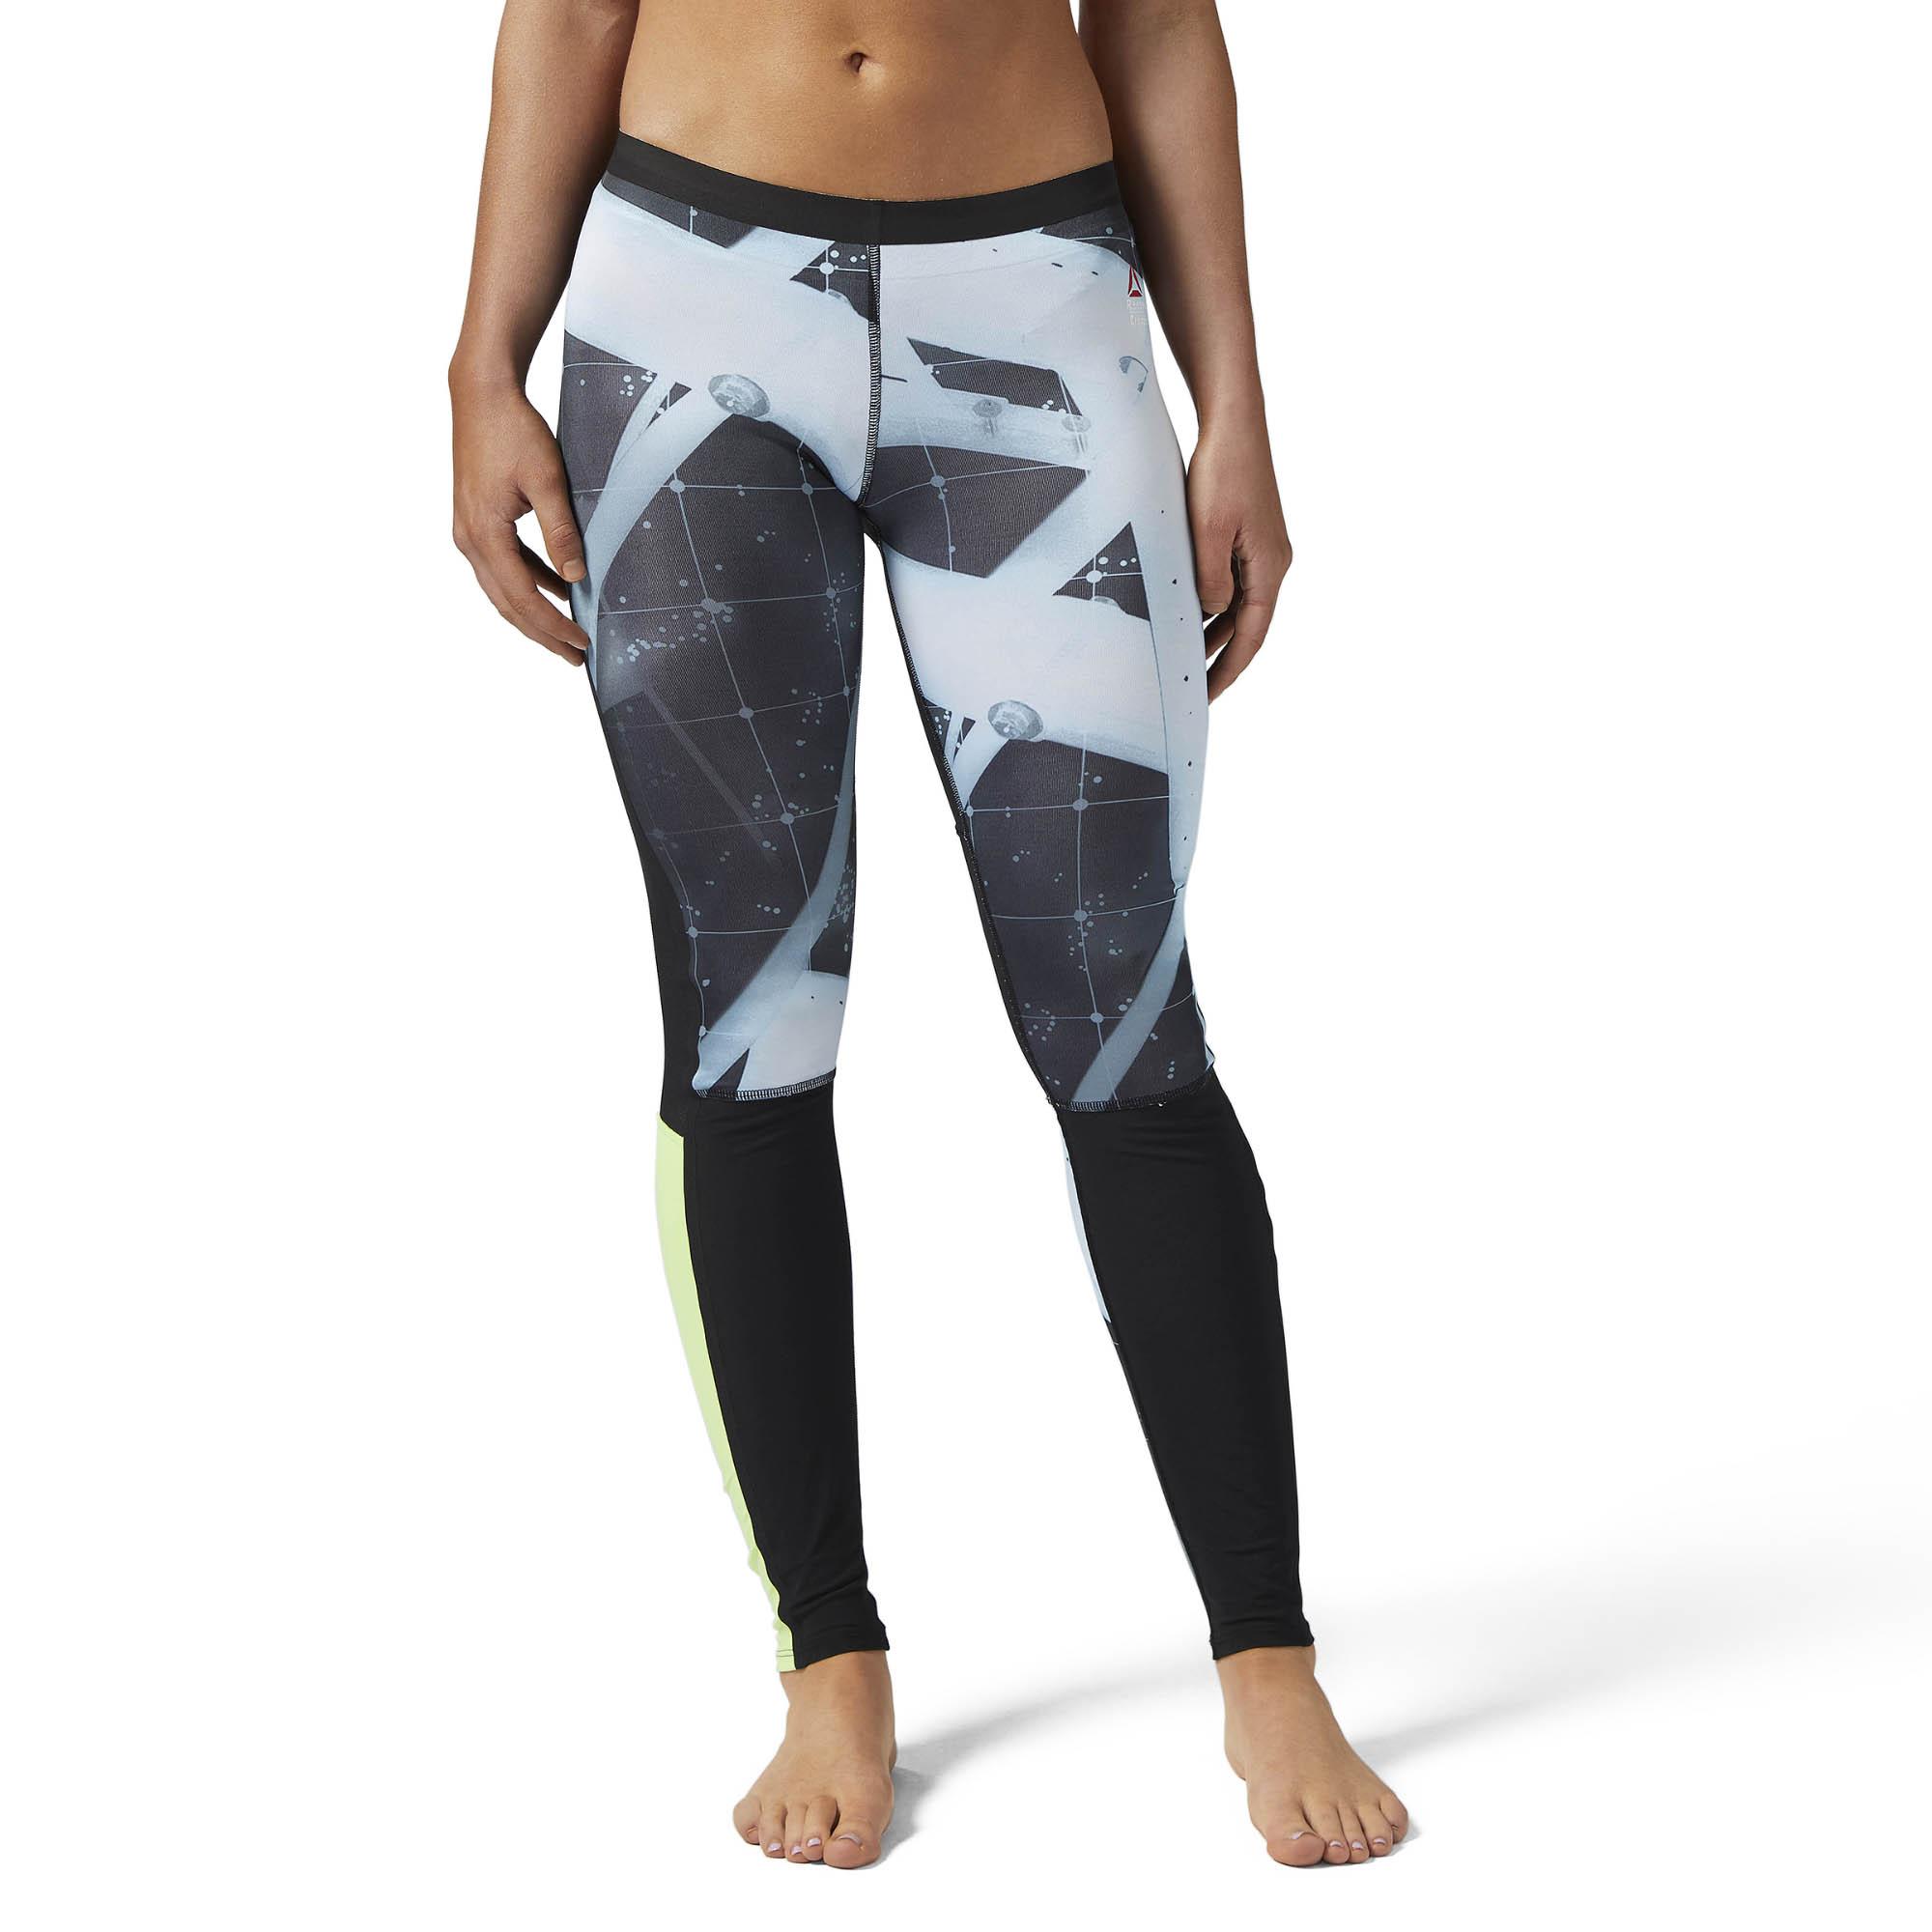 Reebok CrossFit Compression Legging $59.97